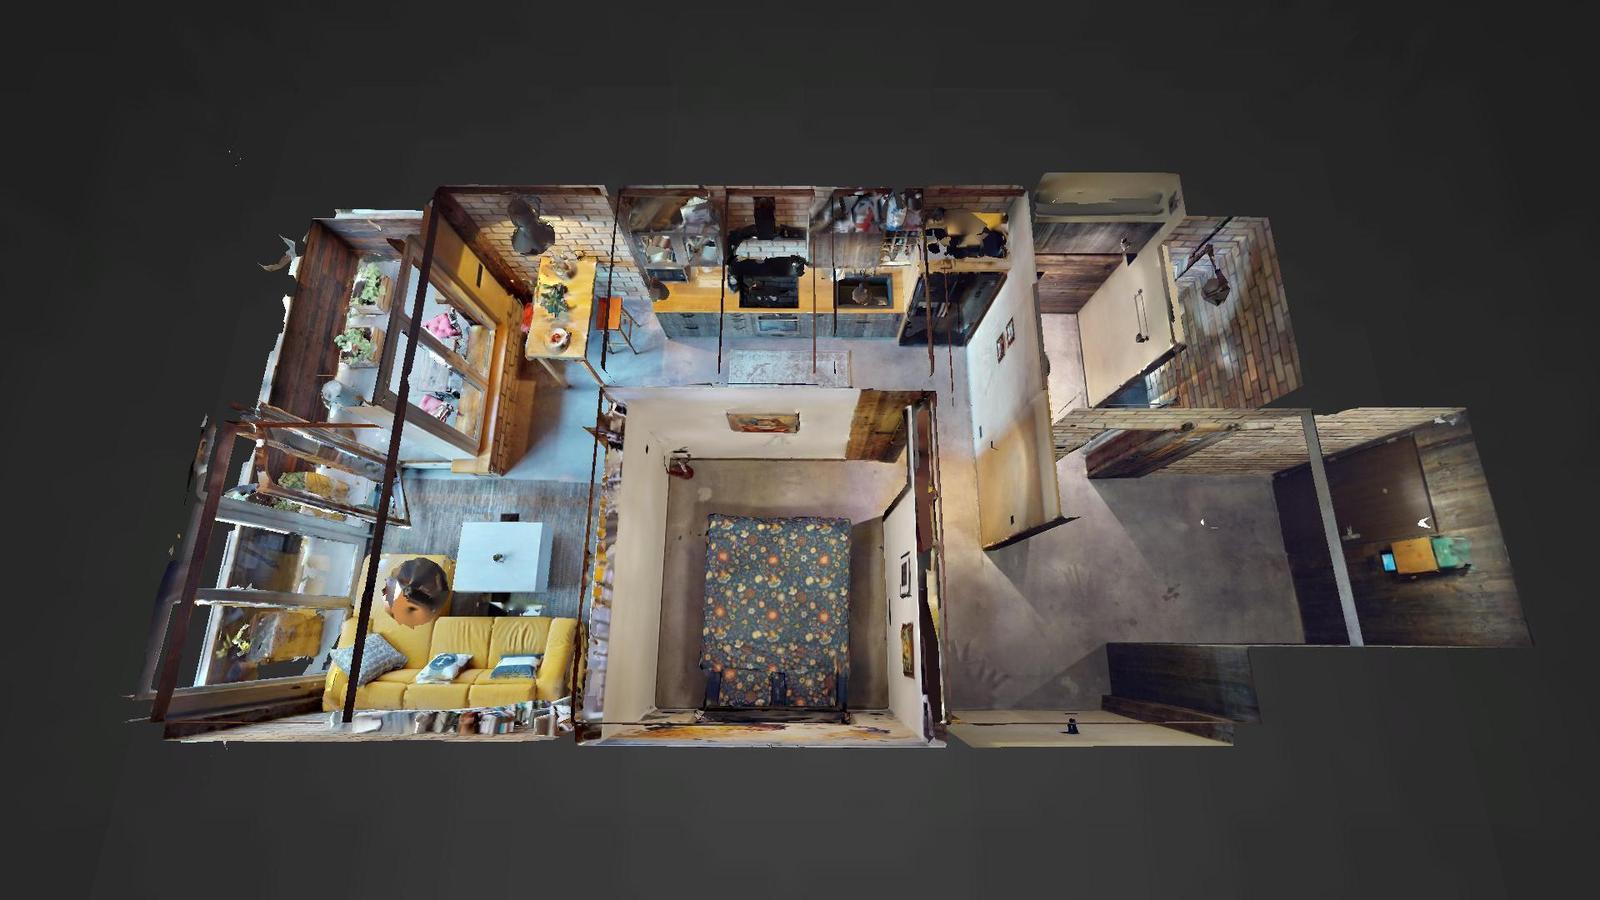 Unikátny byt v BORIA na Štrkovci - Obrázok č. 2